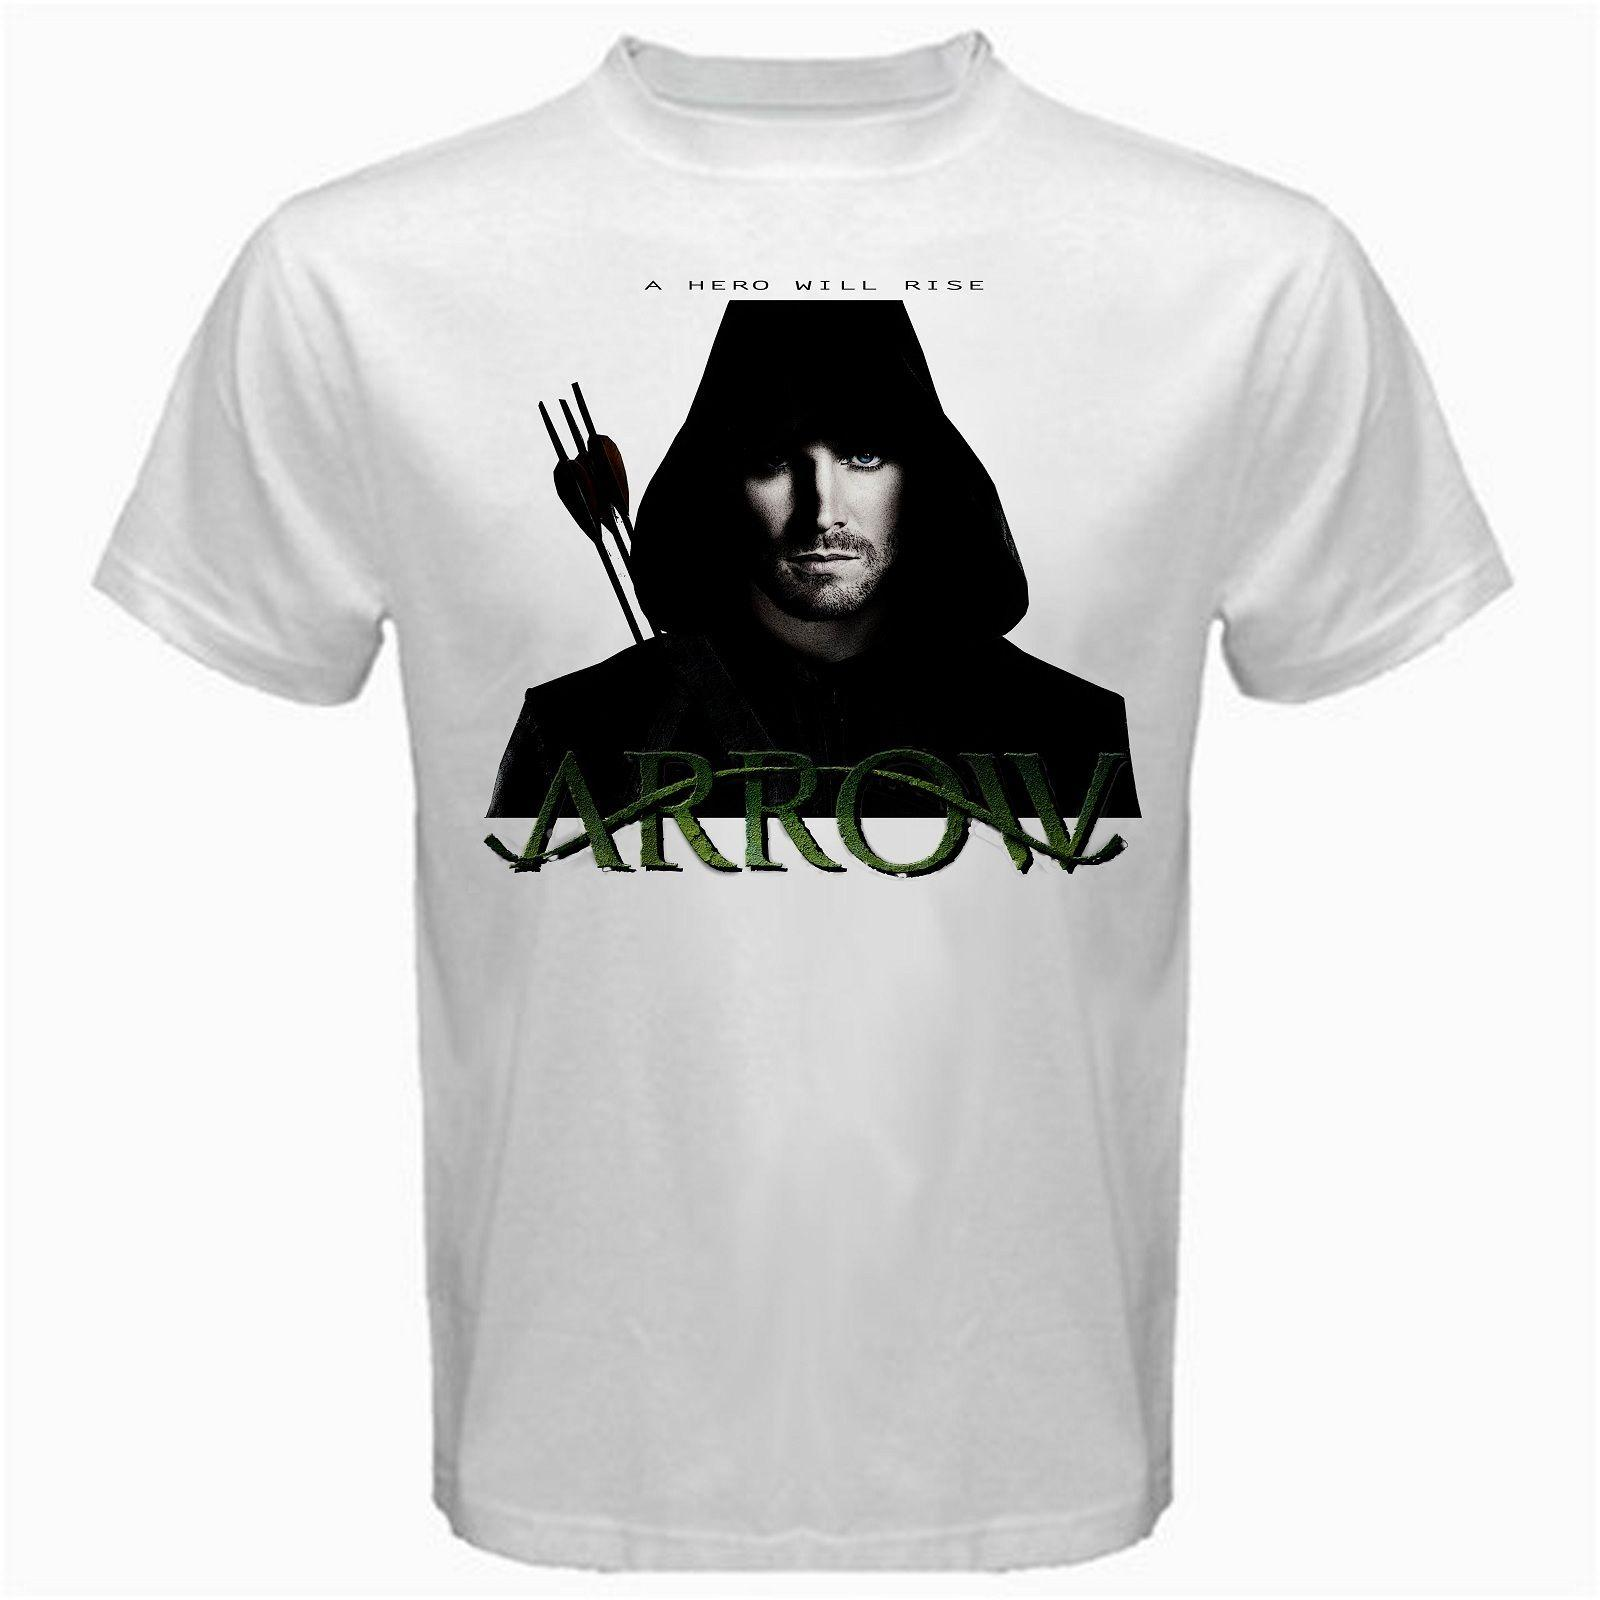 The Green Arrow Dc Comics Series Tshirt White Justice Funny Print